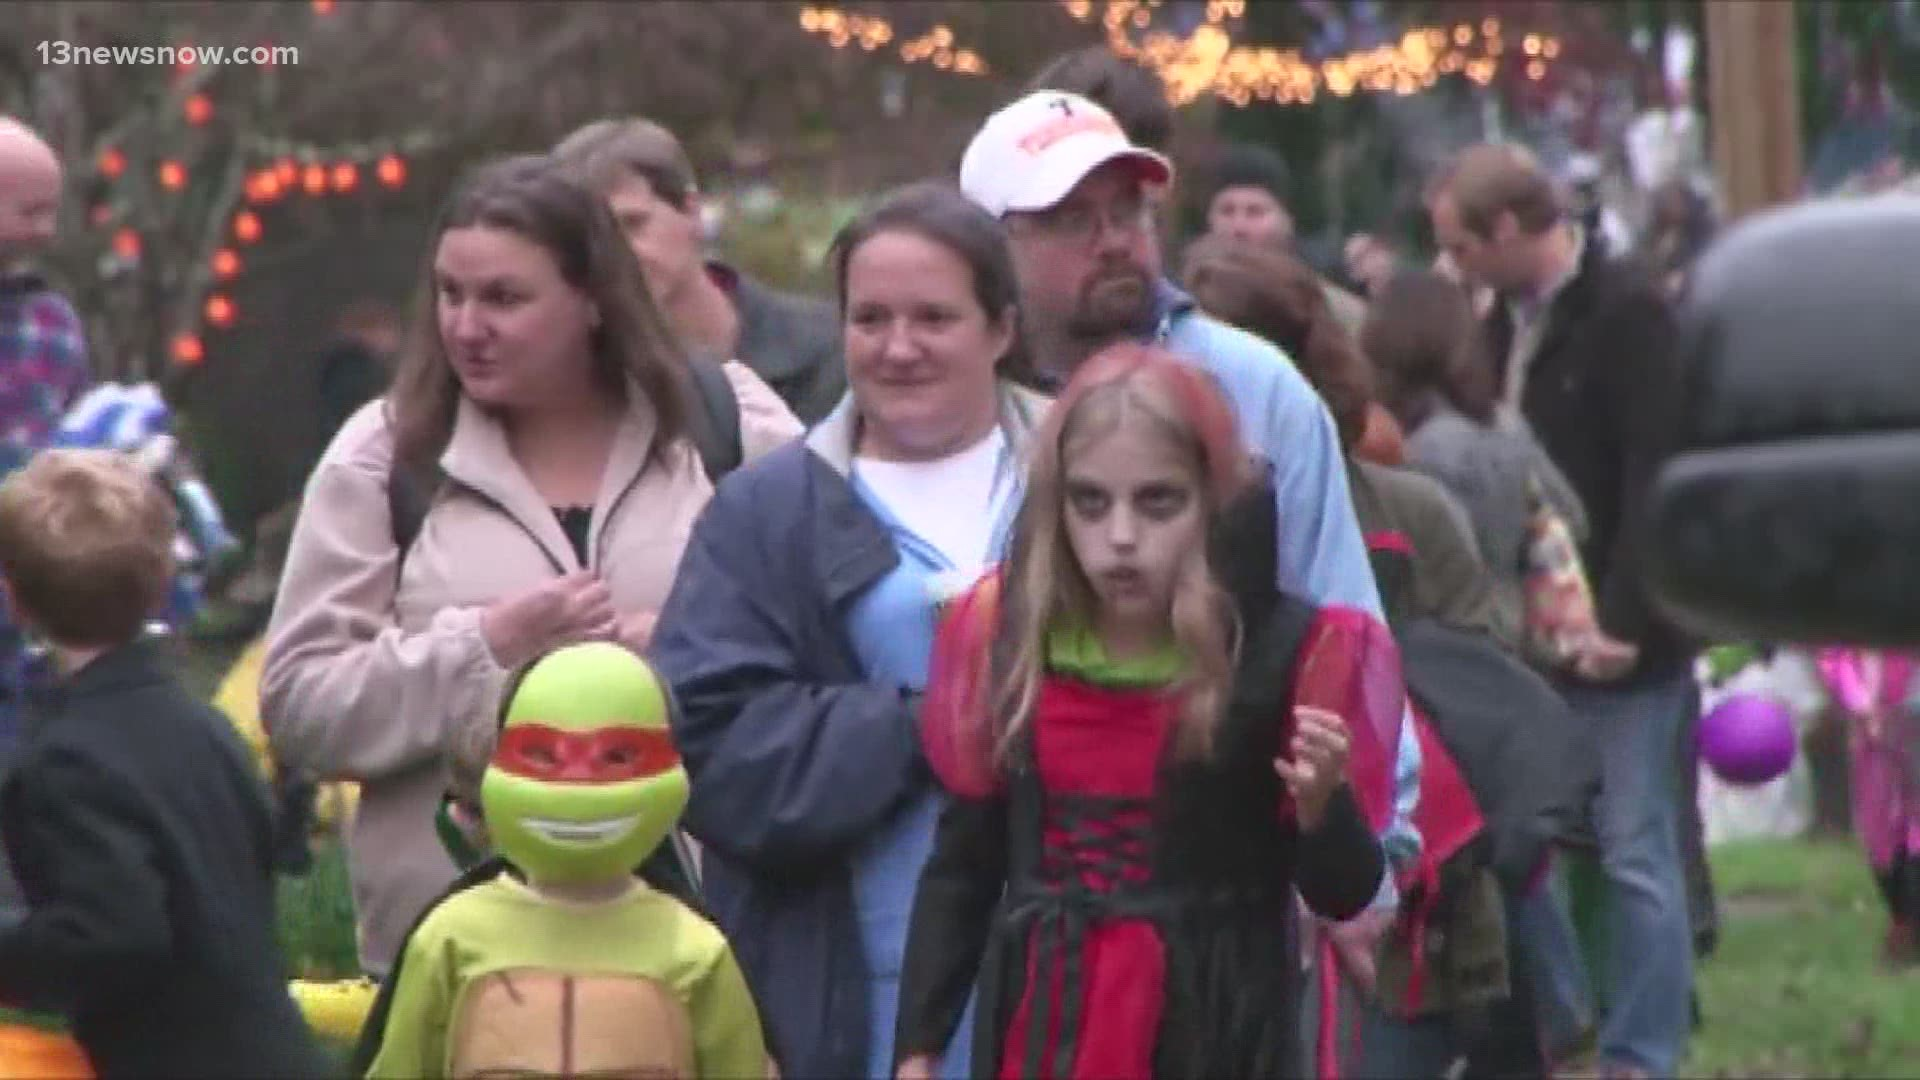 Halloween Events Spokane Wa 2020 Is Halloween canceled this year?   krem.com